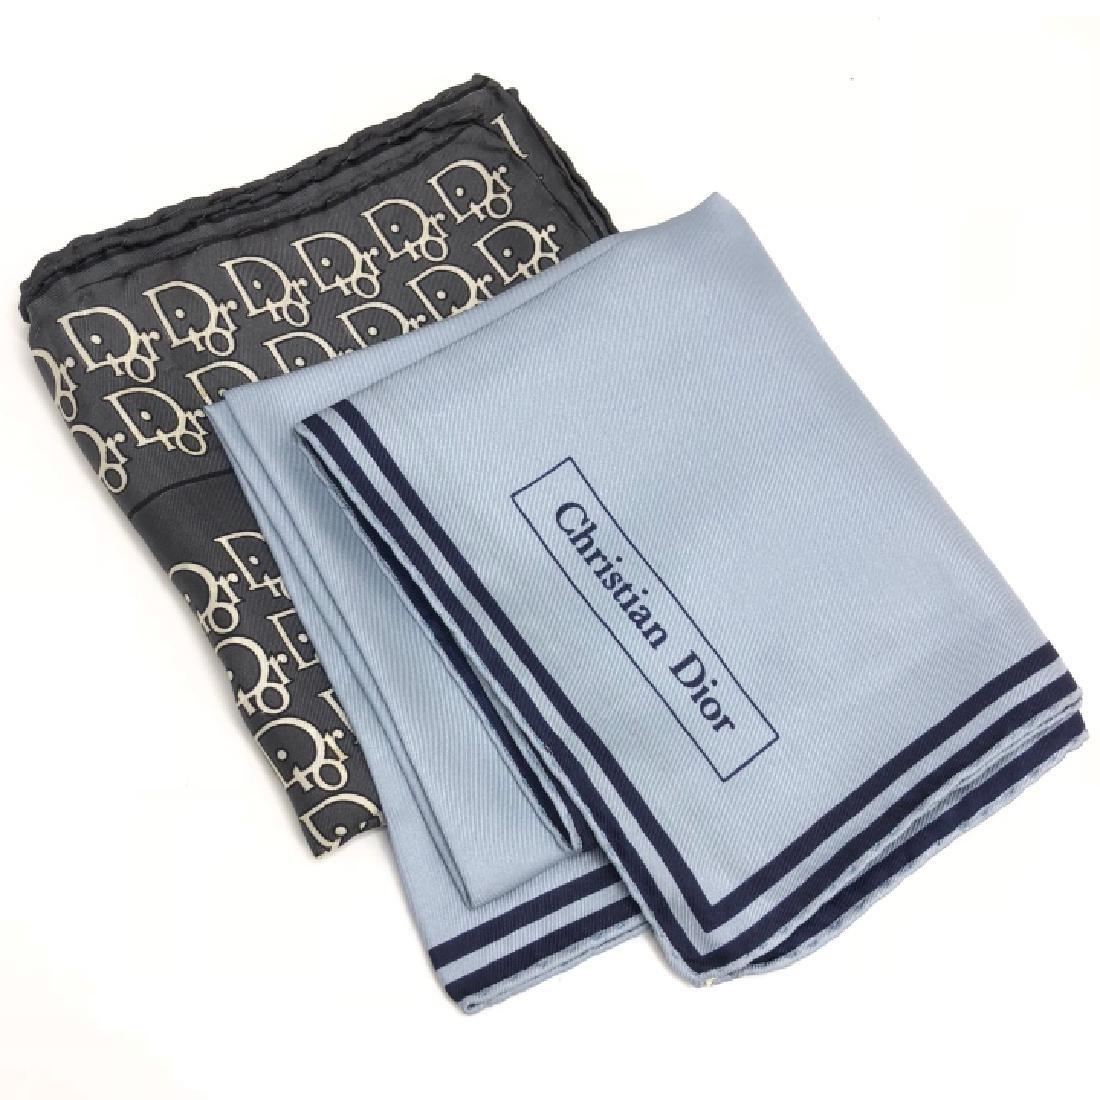 Pair of Vintage Christian Dior Silk Scarves